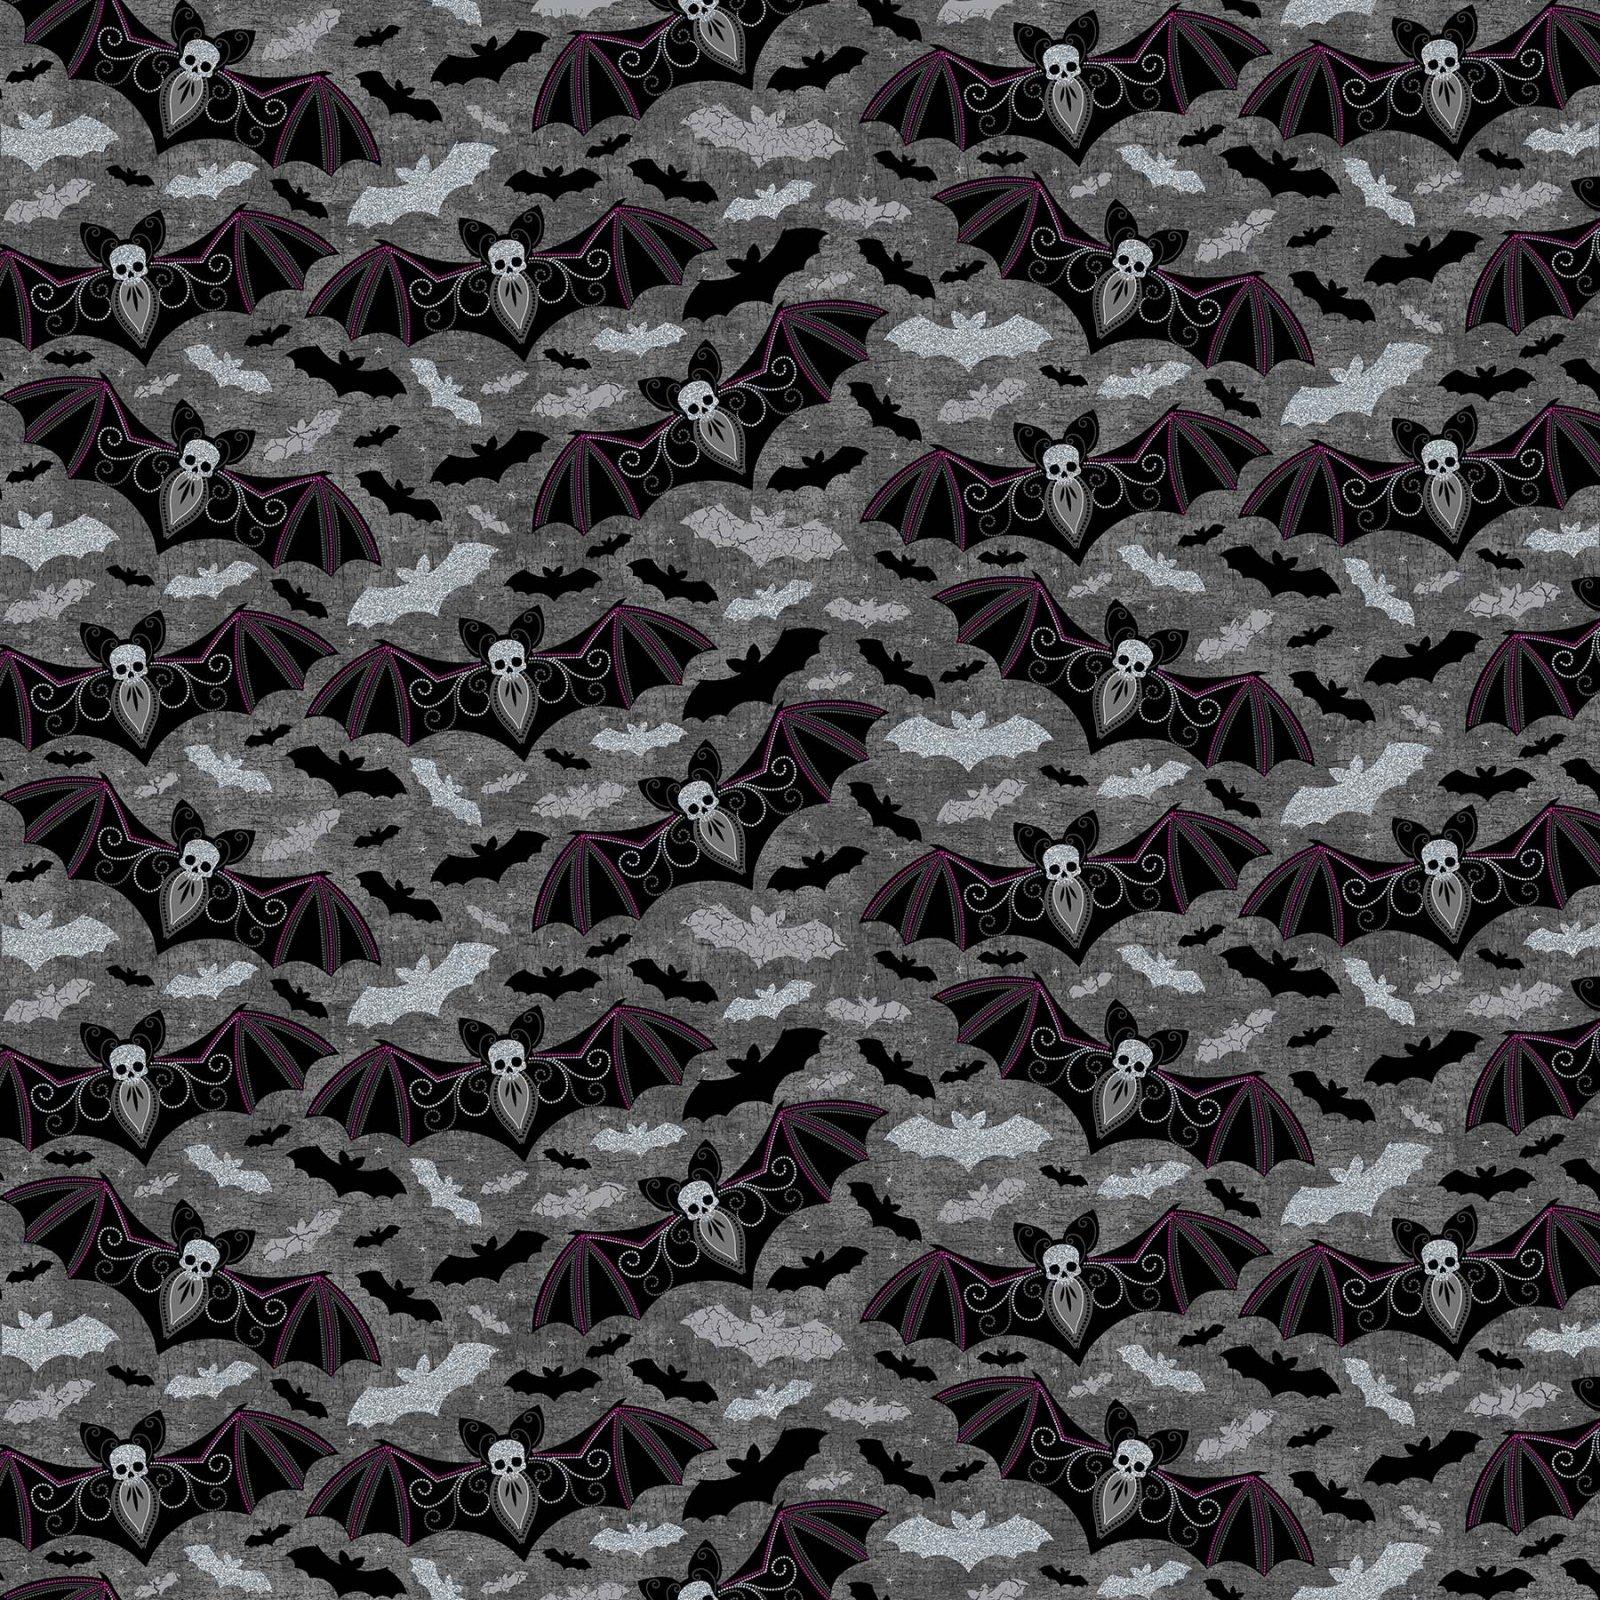 Elegantly Frightful - Dancing Bats